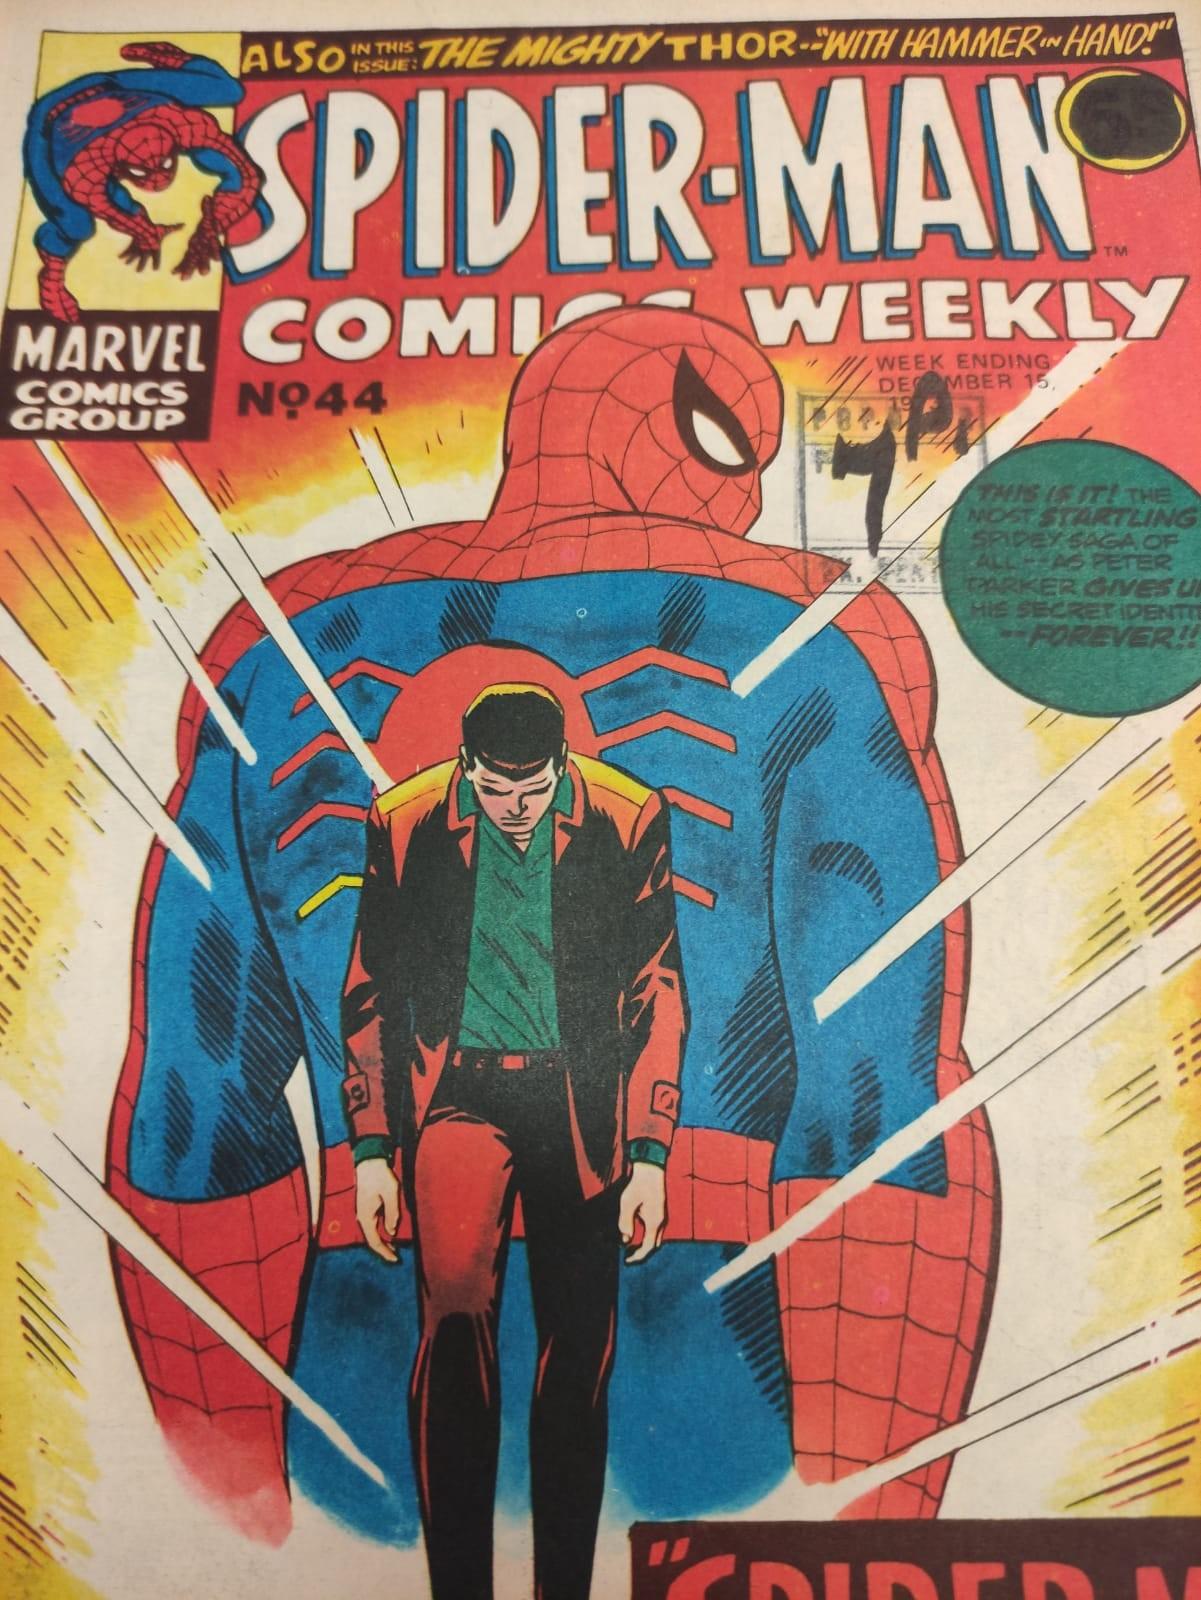 6 x Marvel comics. 1973 Spider-Man comics weekly. - Image 13 of 13